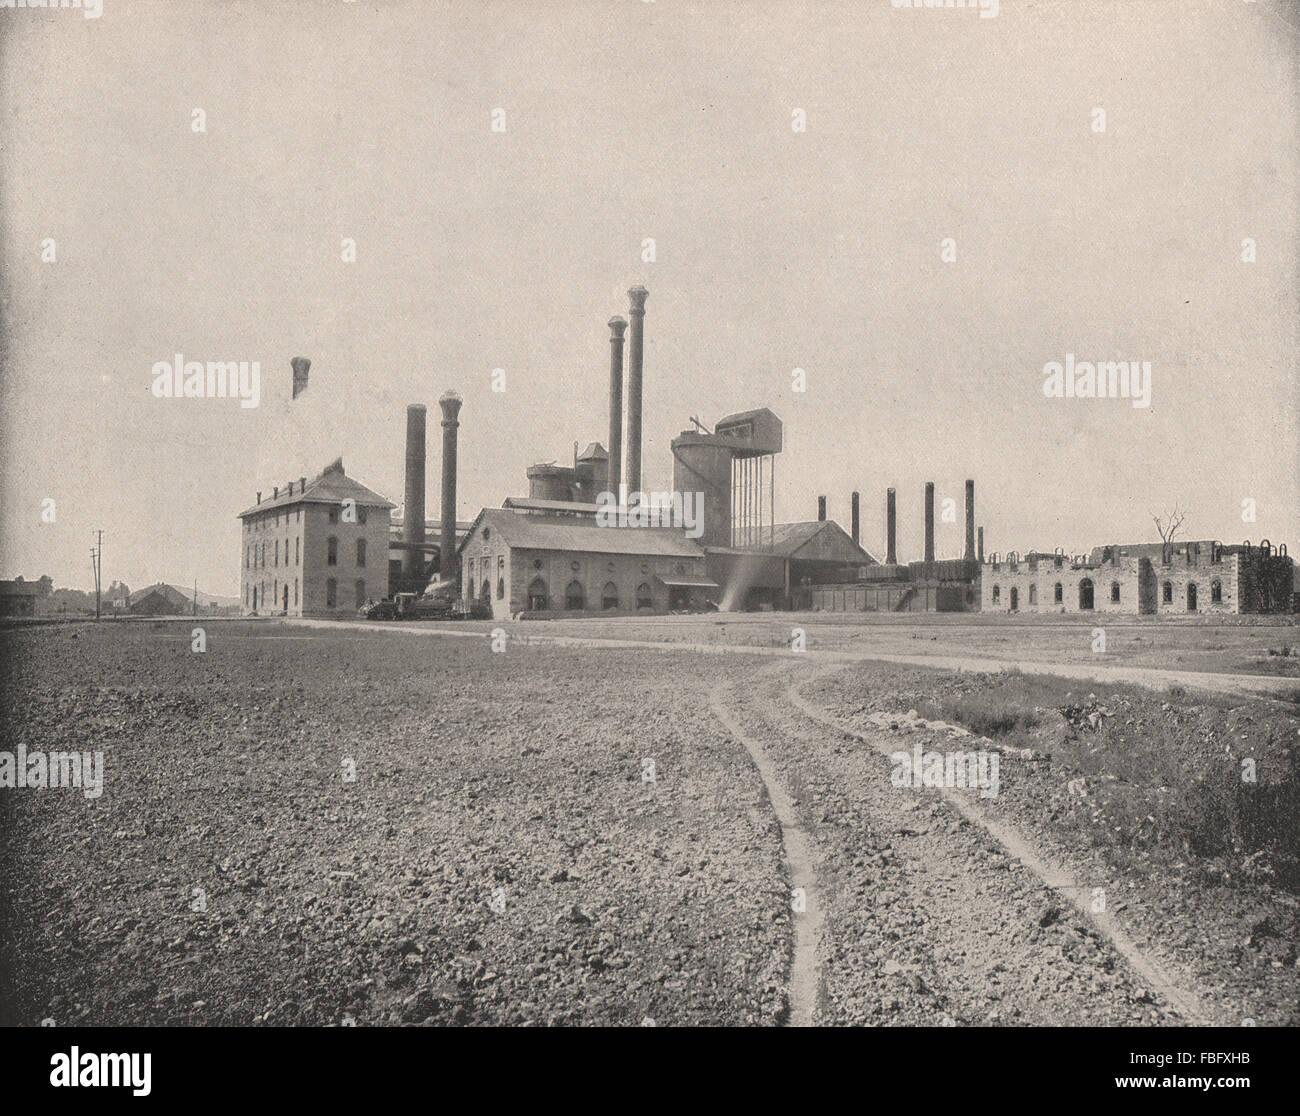 The Colebrook Furnace, Lebanon, Pennsylvania. Foundry